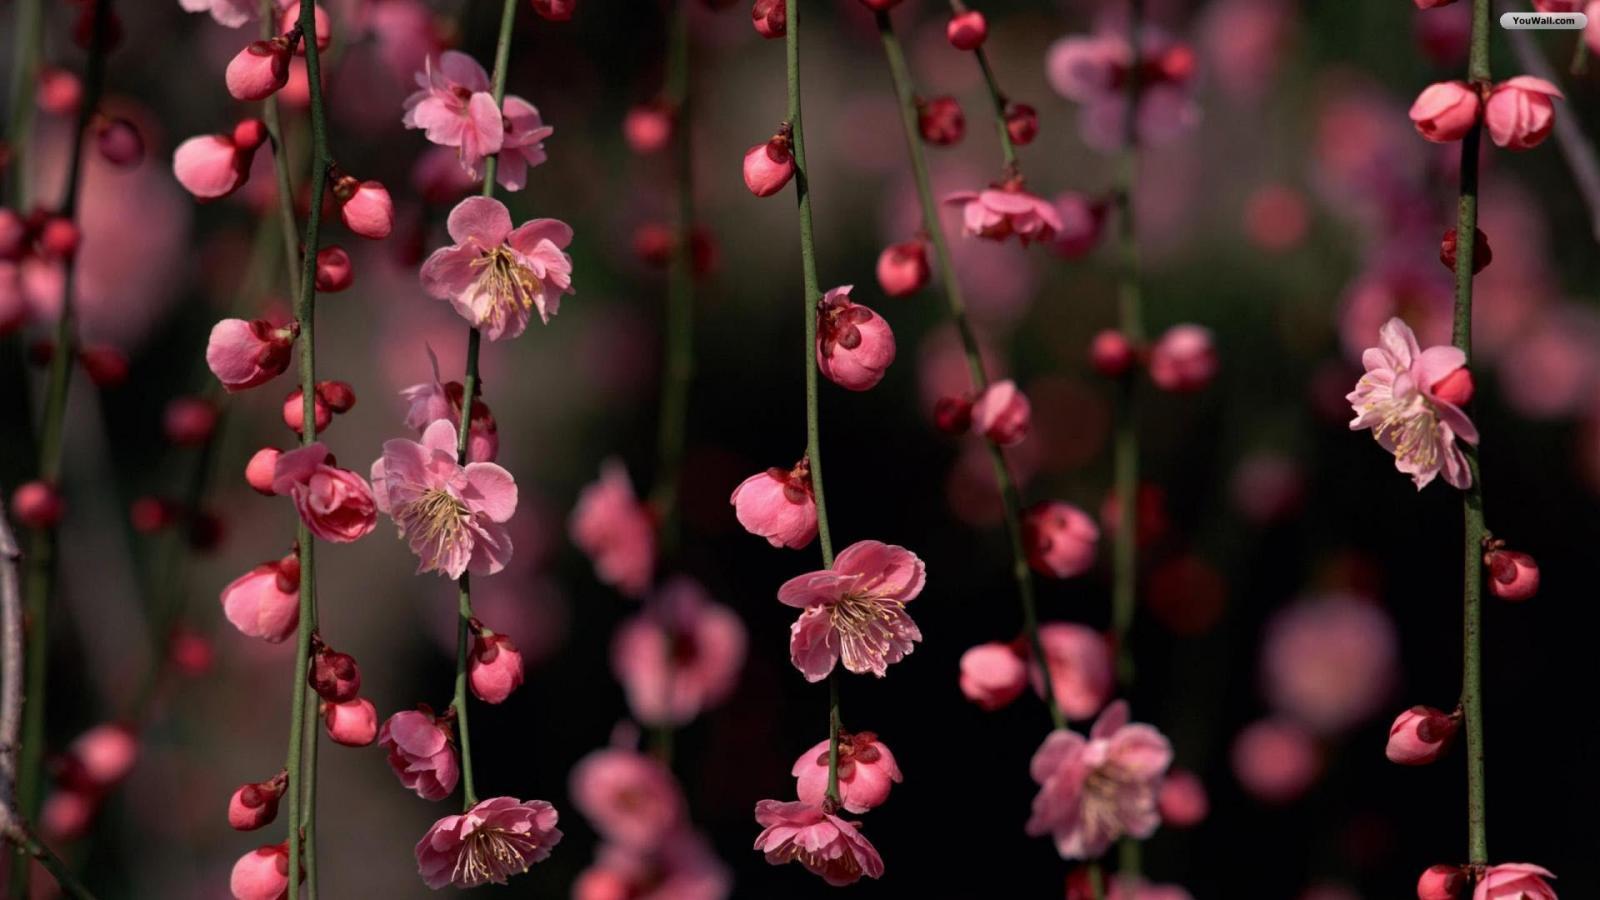 Spring Flowers Wallpaper   wallpaperwallpapersfree wallpaper 1600x900